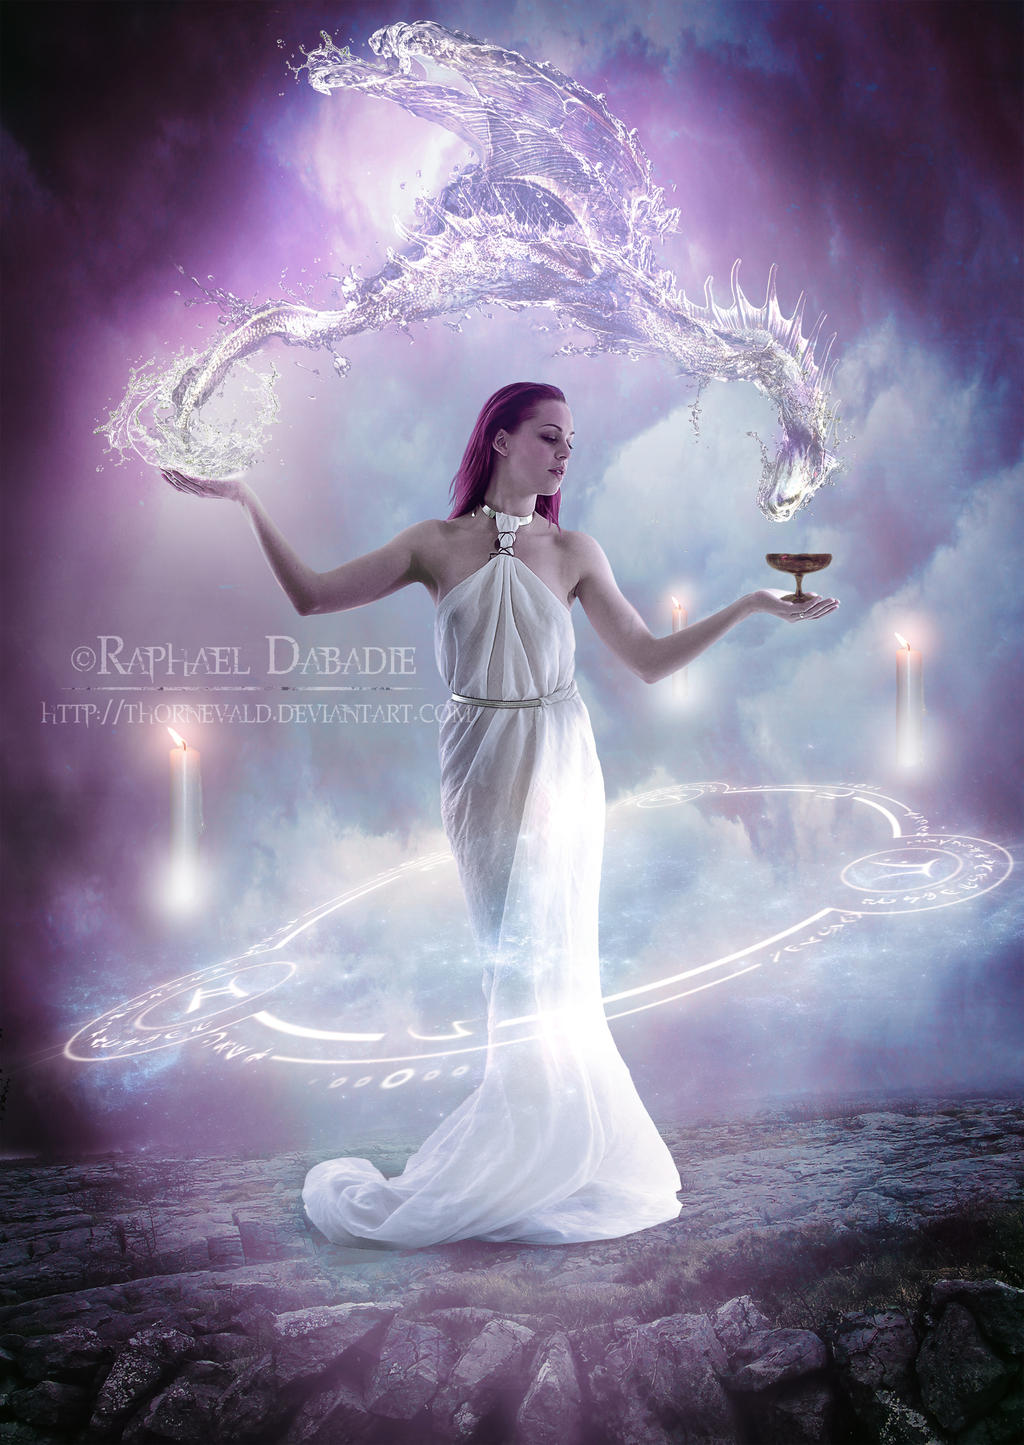 Xiv Temperance Balance Archangel Zadkiel: Temperance XIV By Thornevald On DeviantArt